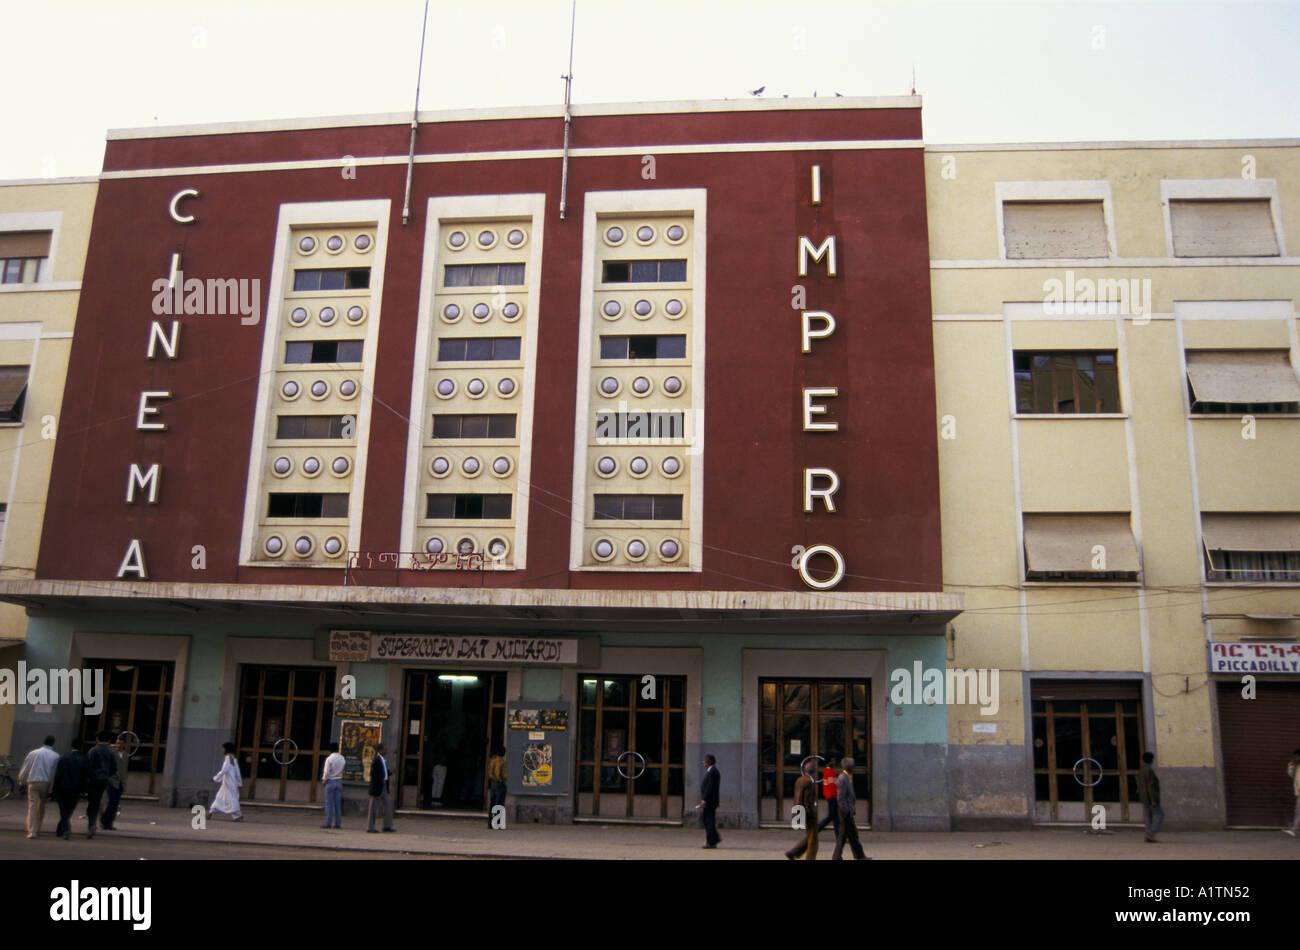 CINEMA IMPERO ERITREA 1993 - Stock Image